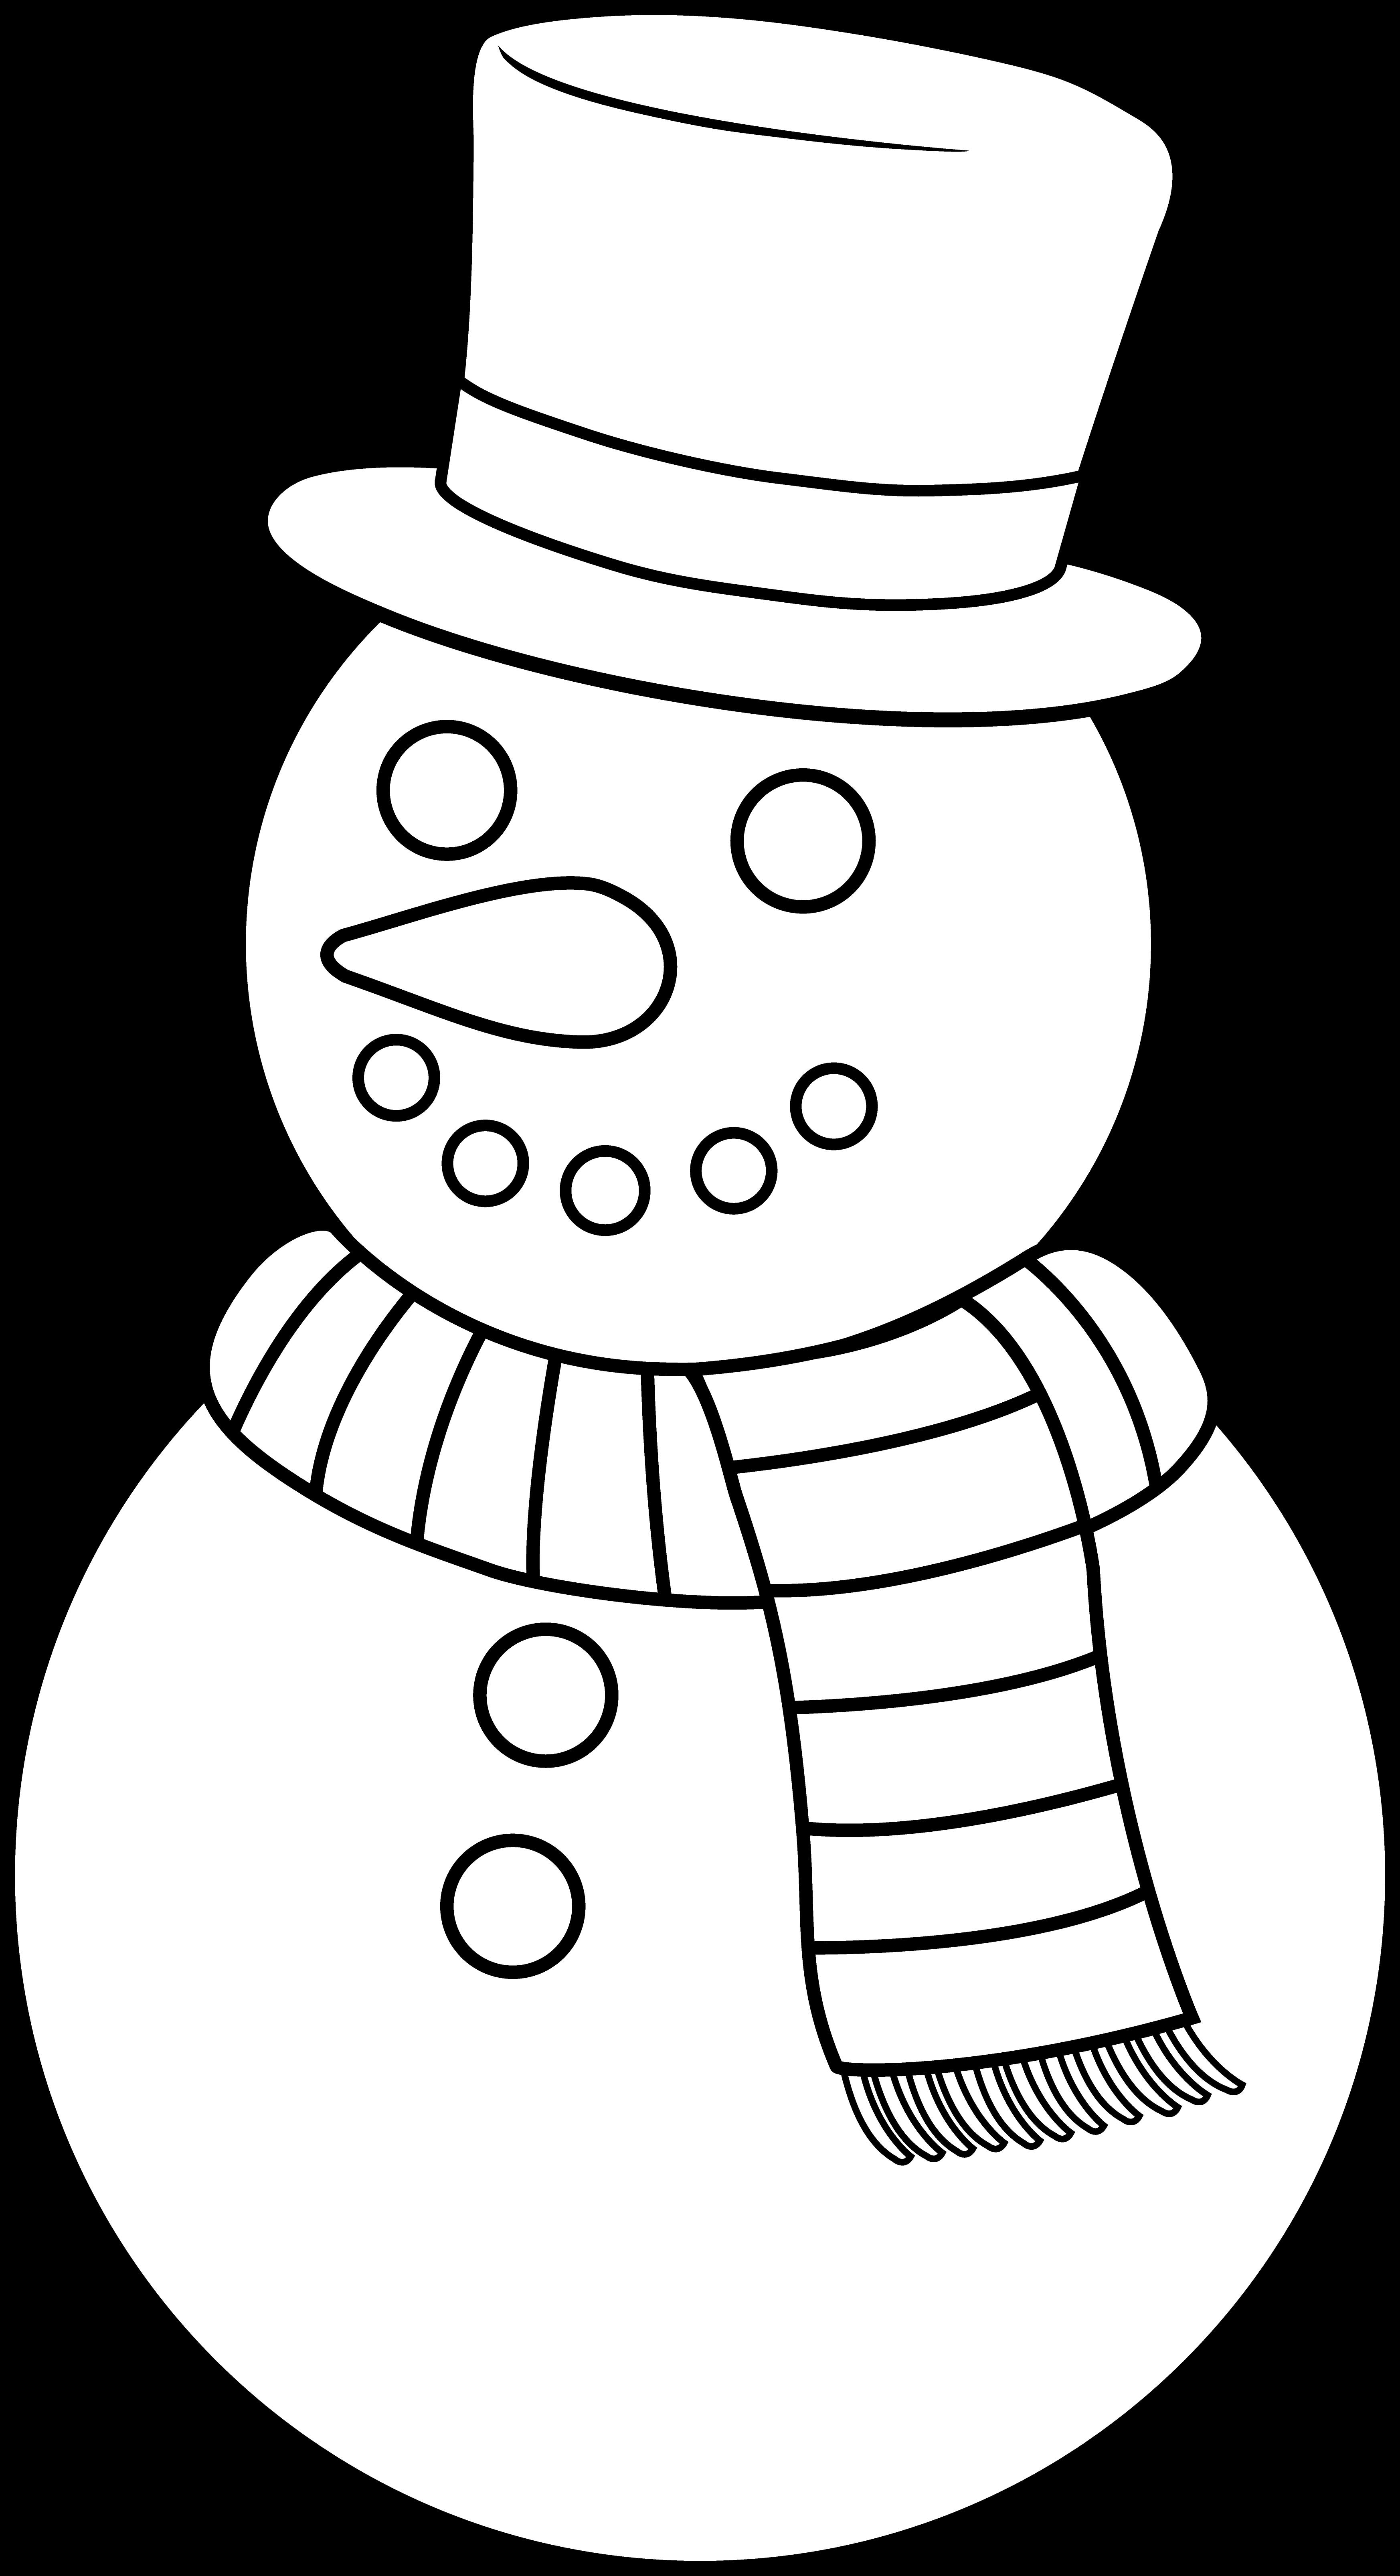 Snowman scarf outline clipart